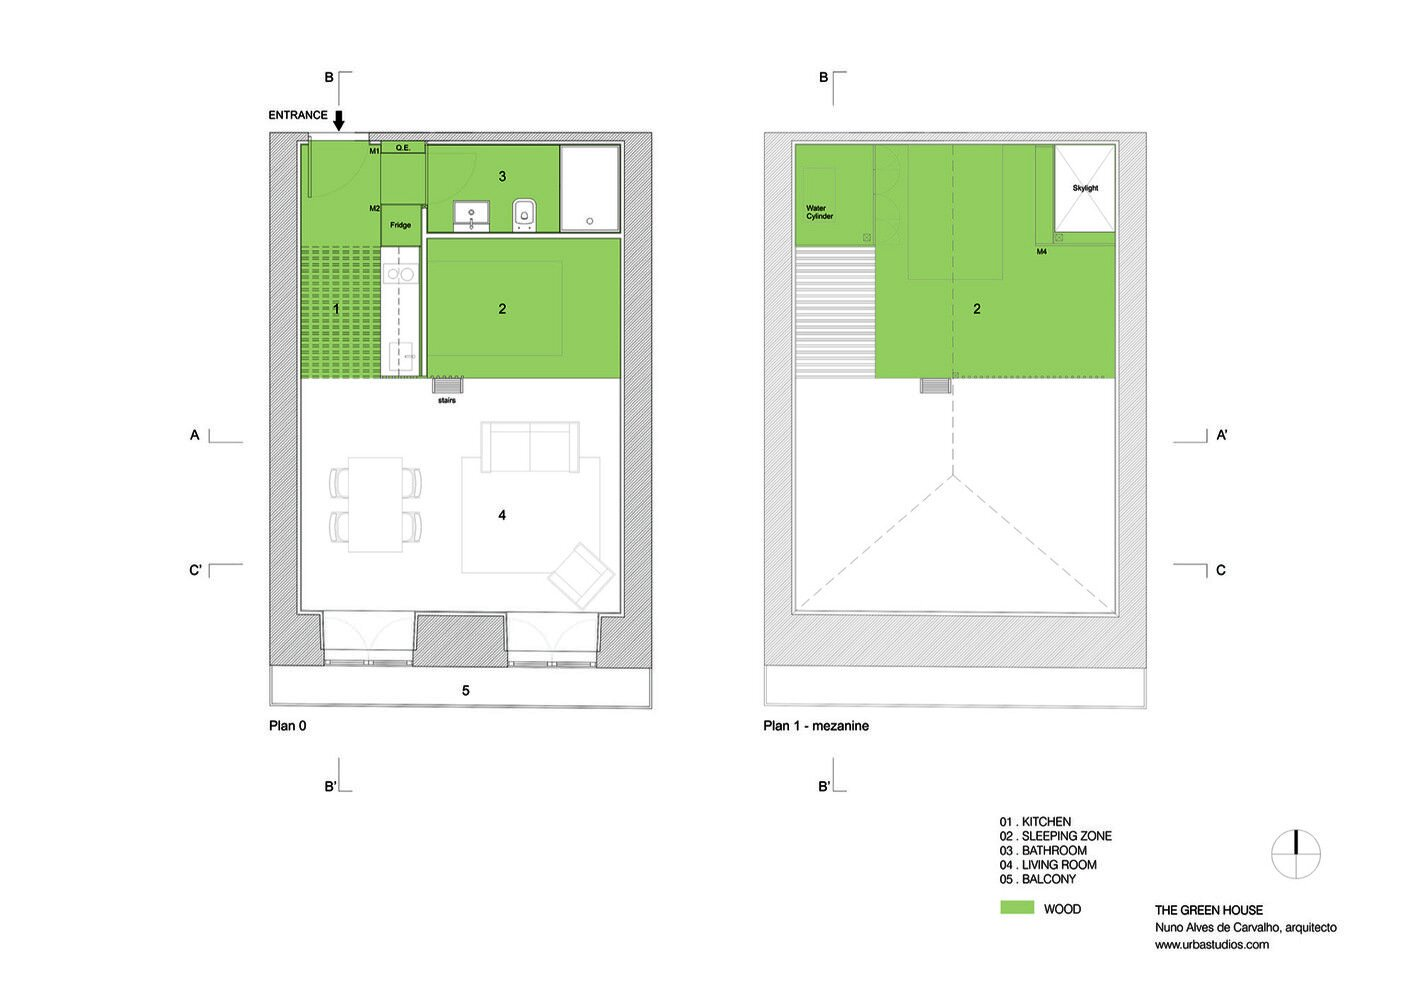 The Green House - URBAstudios - Portugal - Floor Plan - Humble Homes